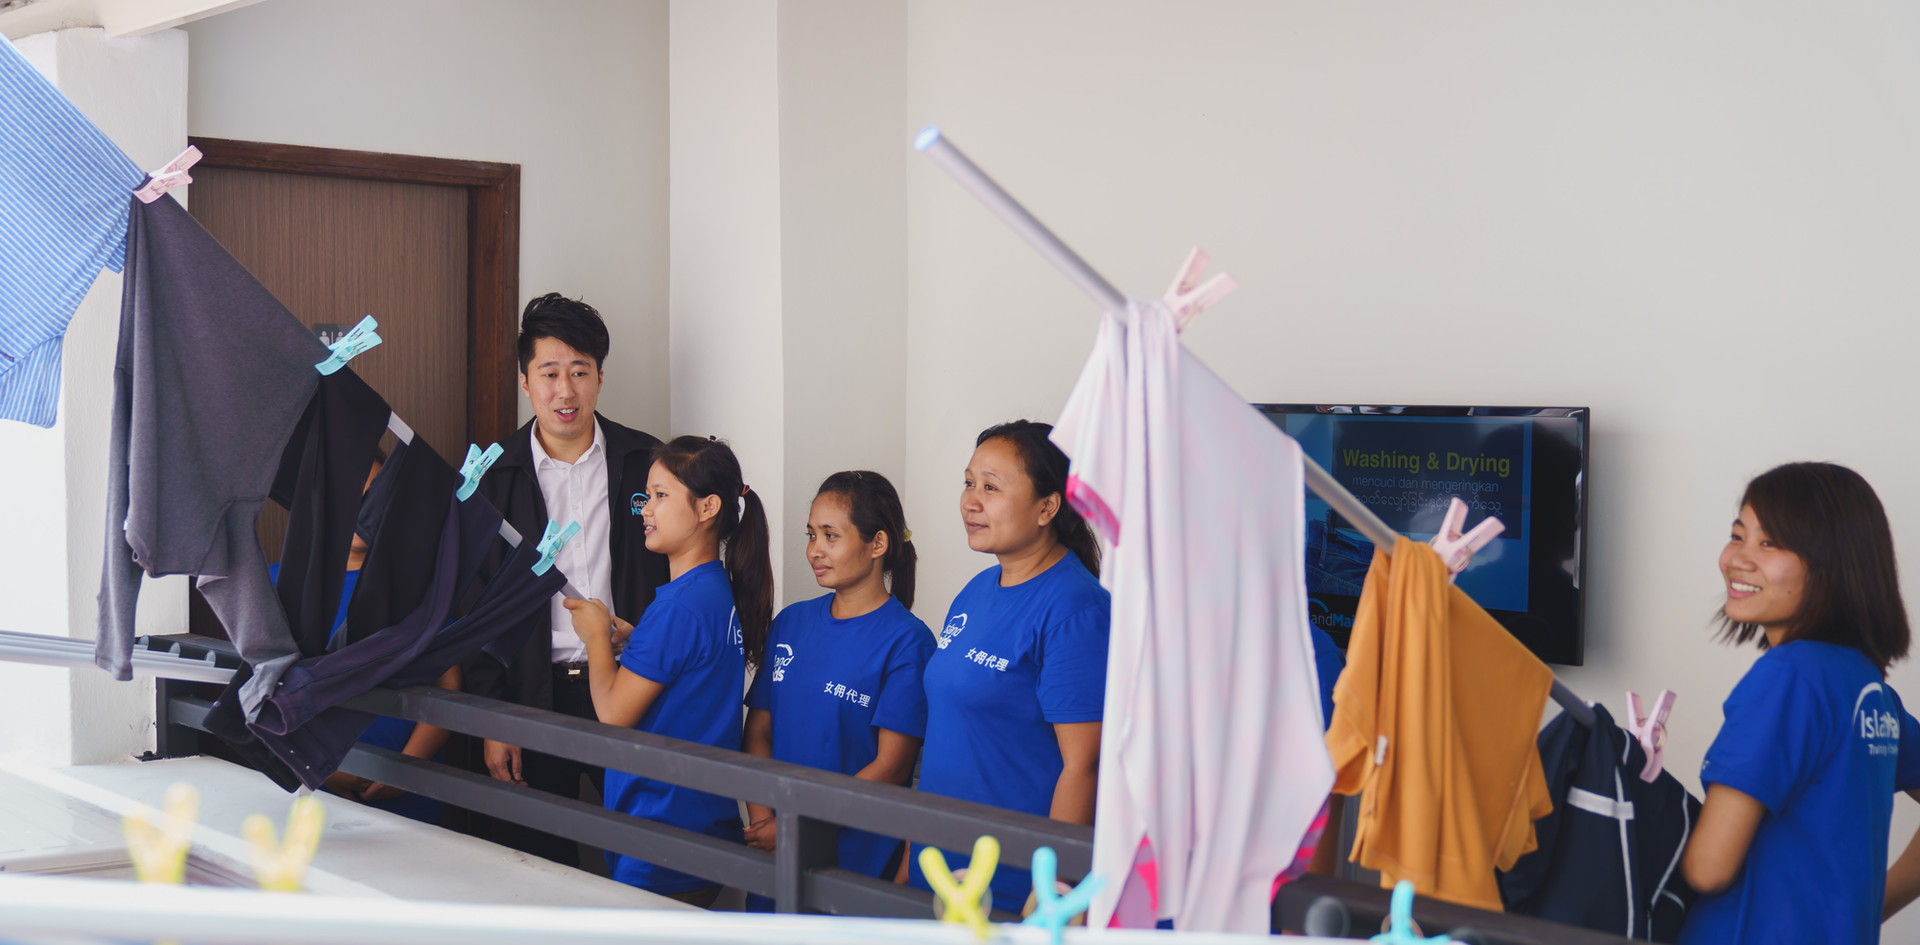 Hanging Laundry - Island Maids Training.